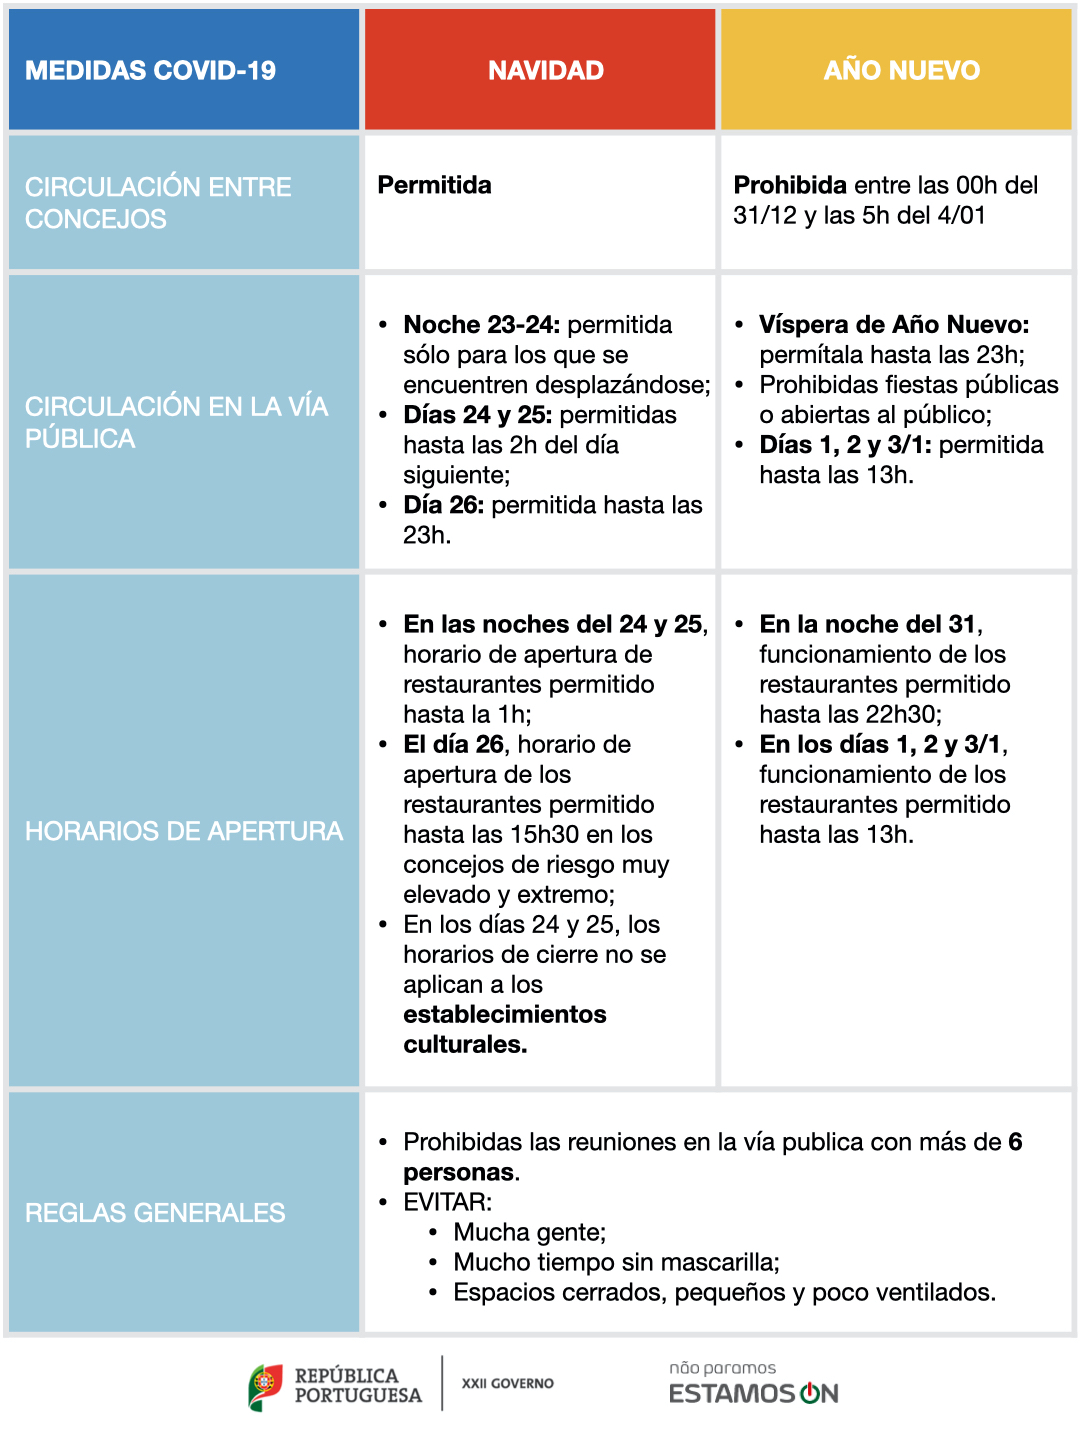 Medidas Covid-19 Portugal en Español